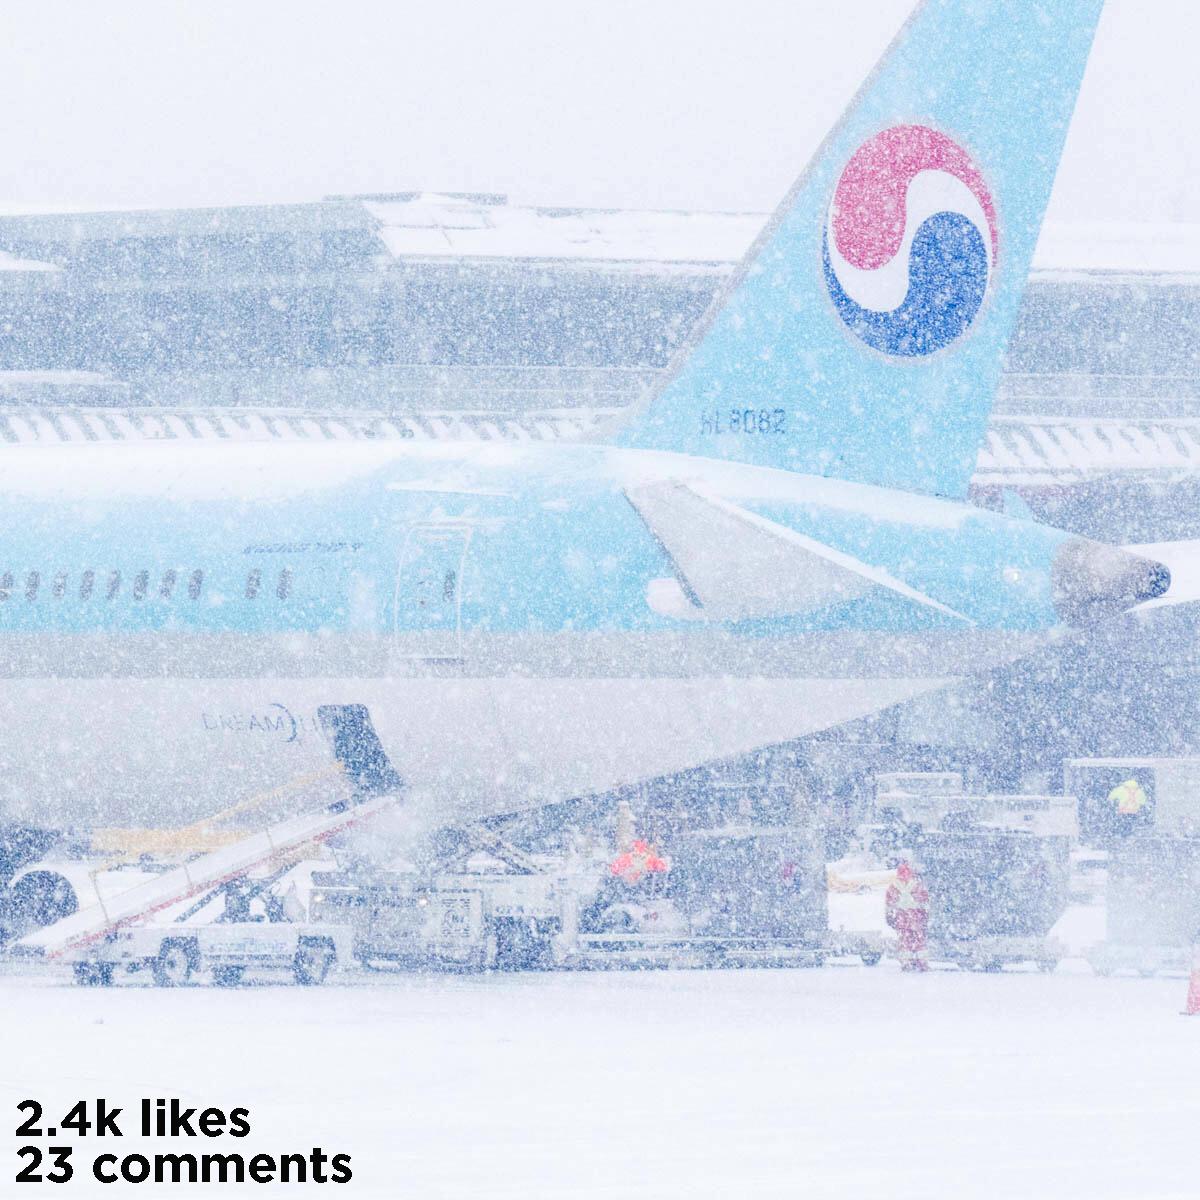 media kit ke 787 snow (1 of 1).jpg